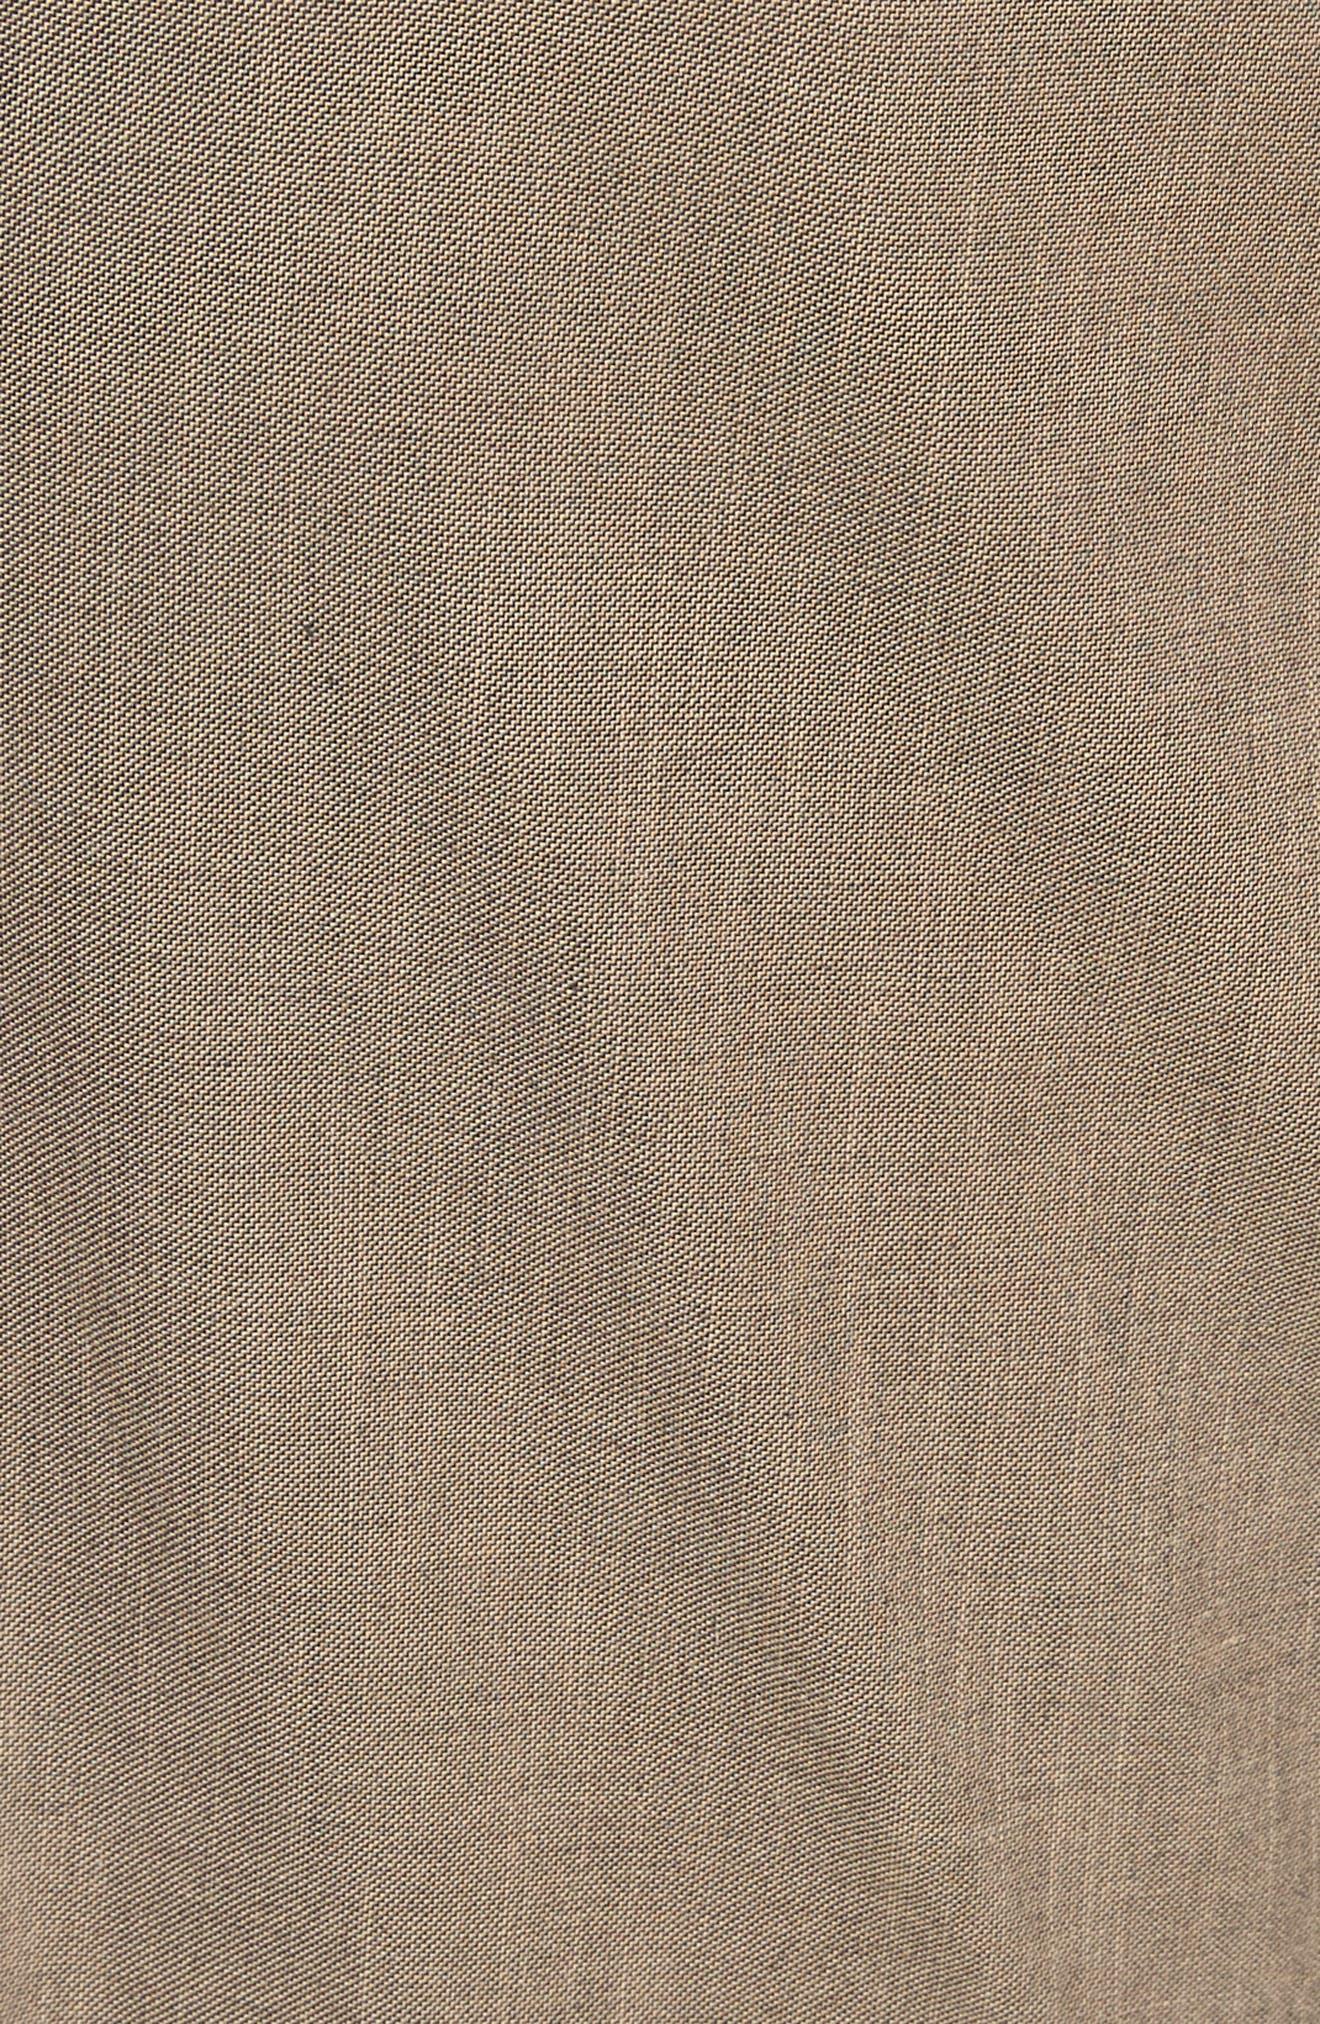 French Pocket Stretch Straight Leg Pants,                             Alternate thumbnail 5, color,                             Dark Beige